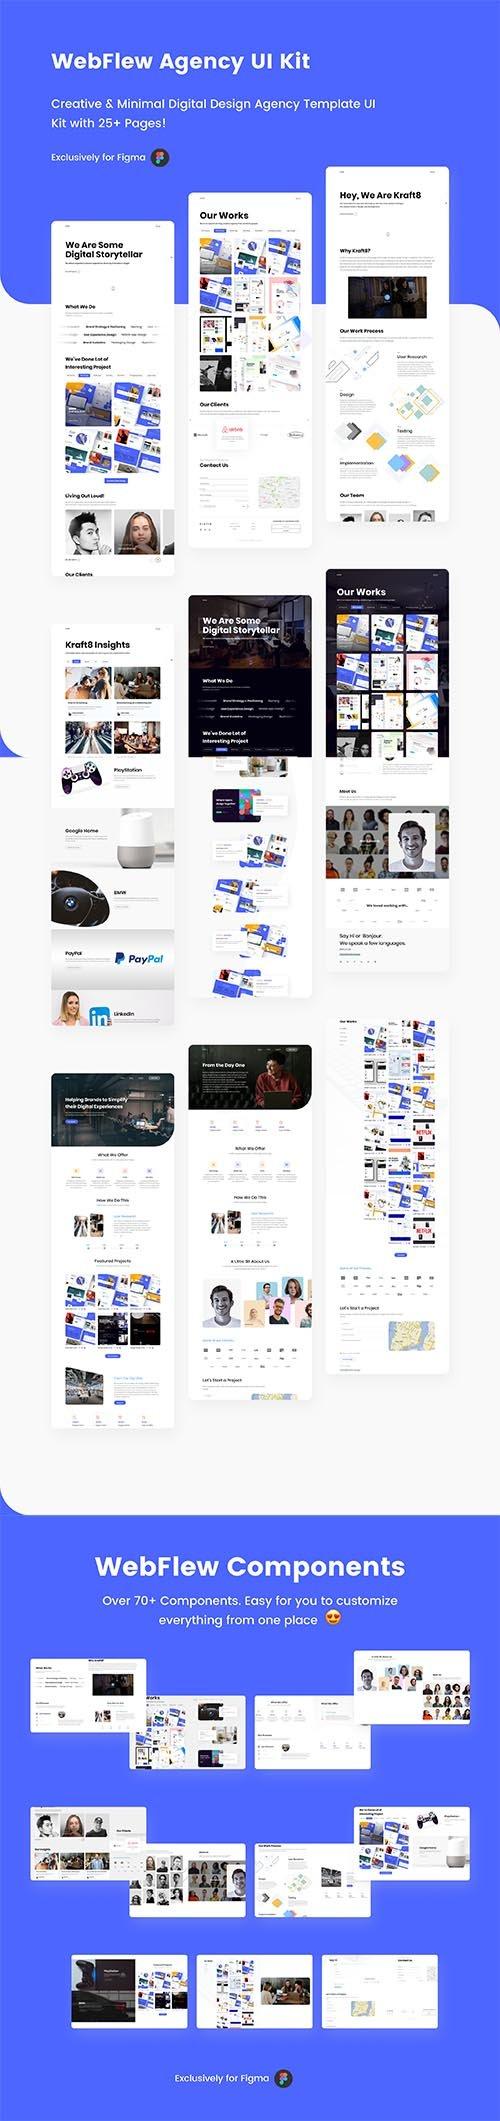 Webflew Agency Template UI Kit